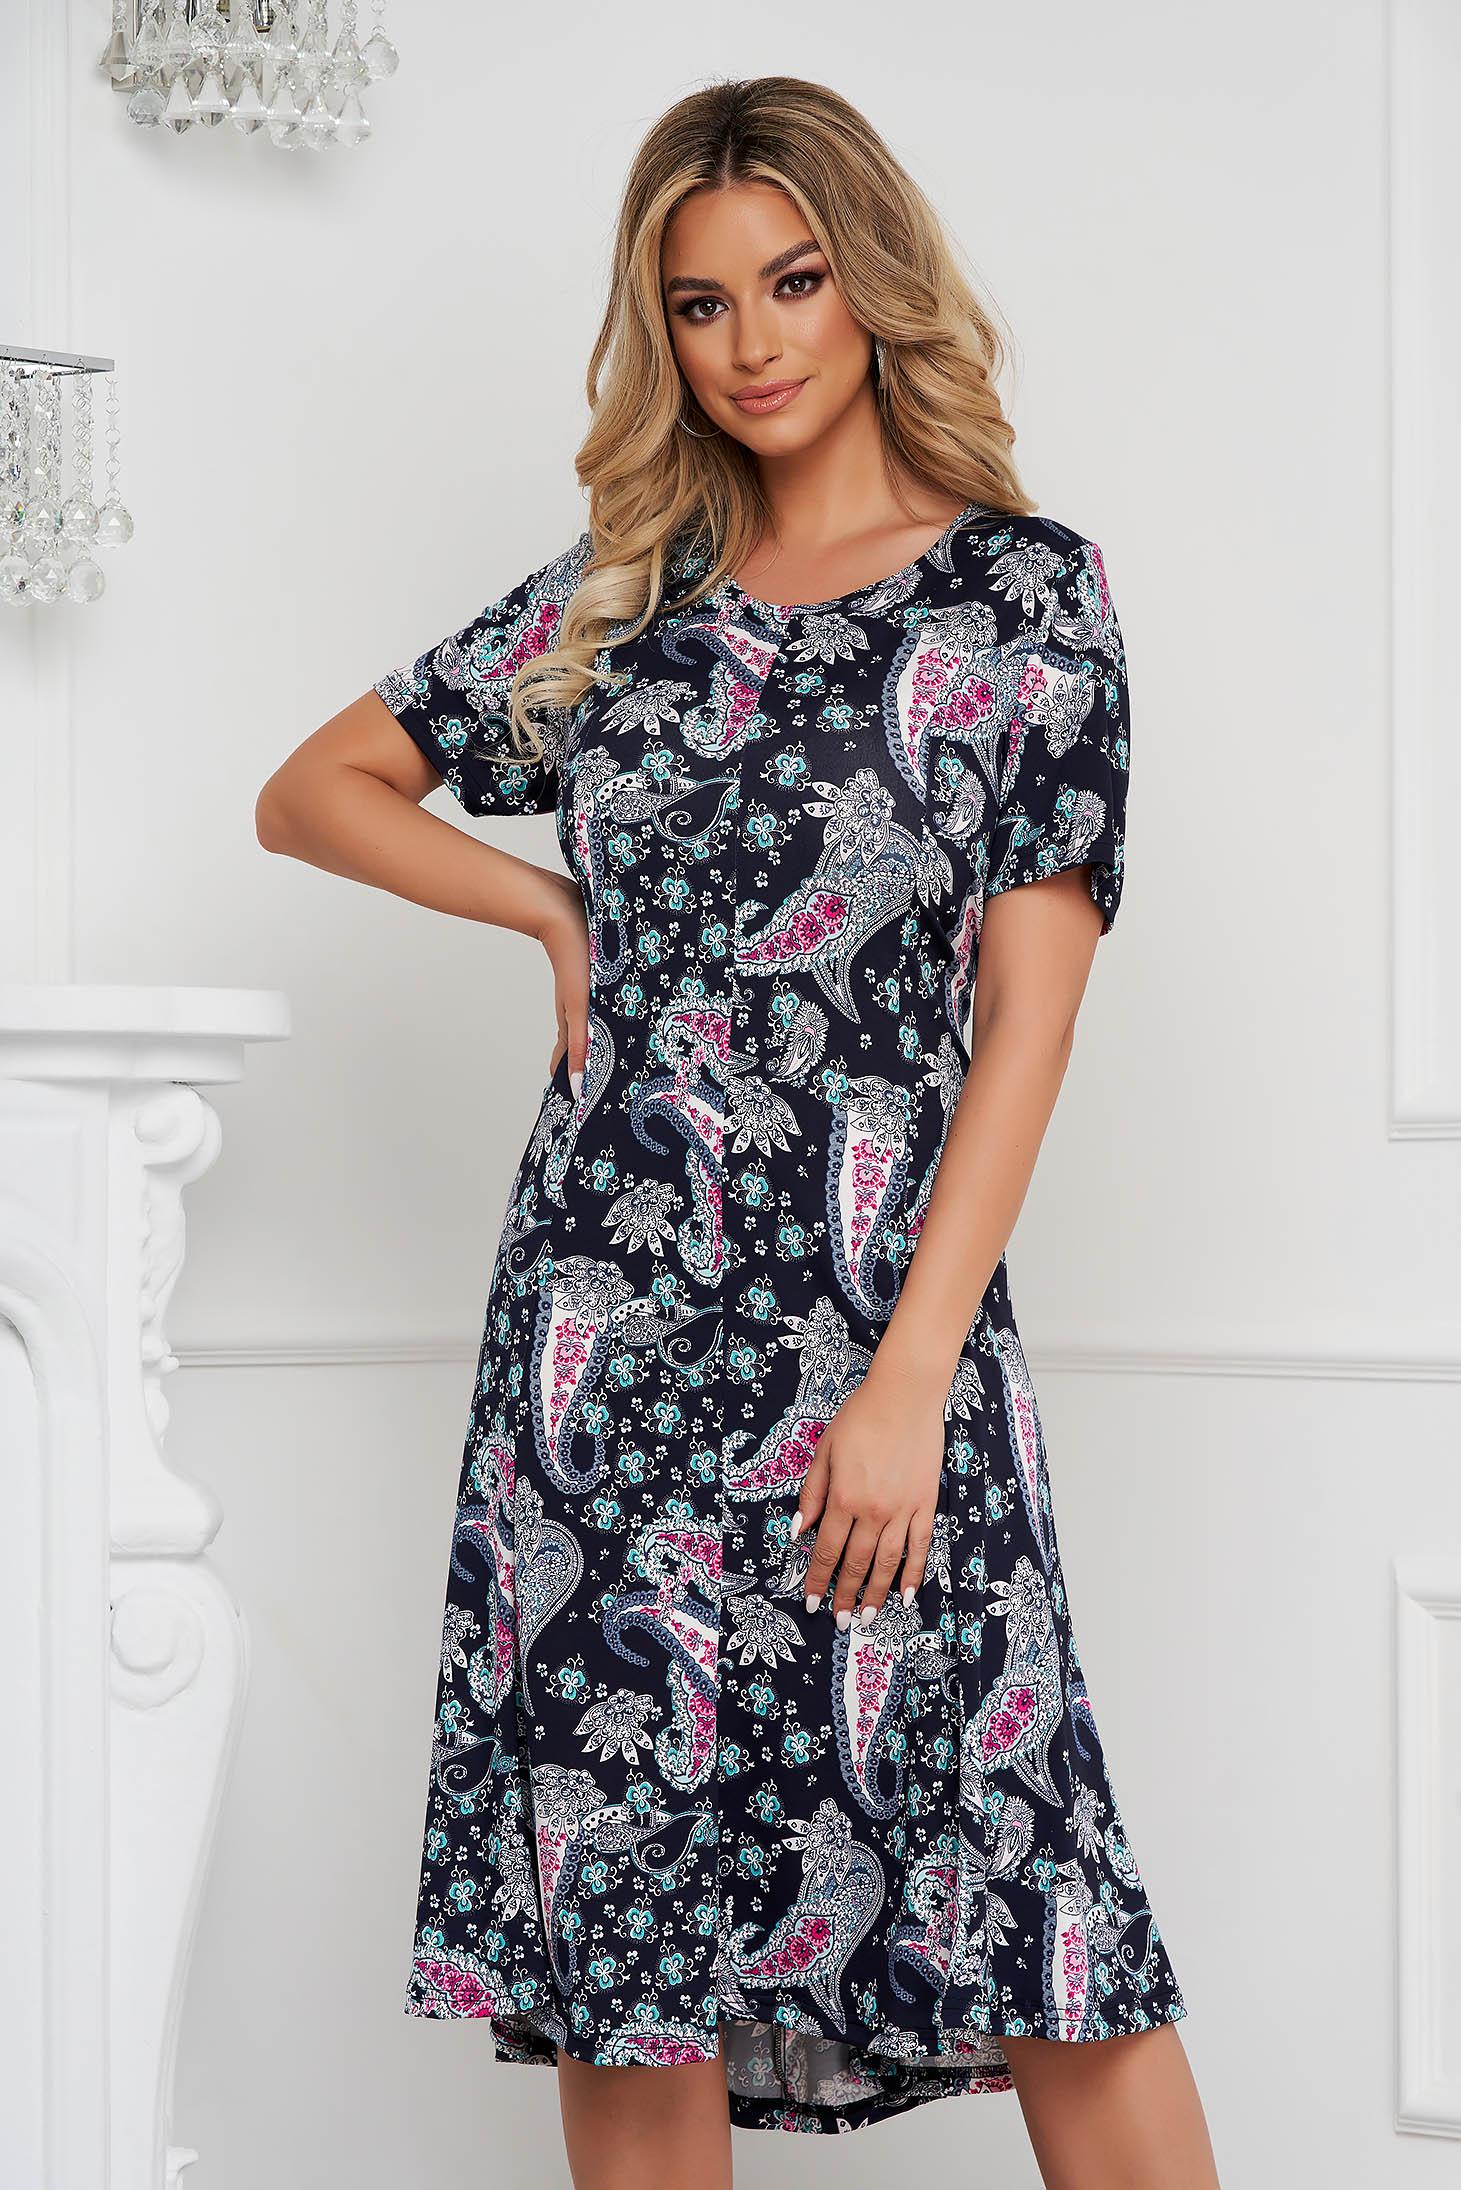 Dress midi cloche from elastic fabric short sleeves